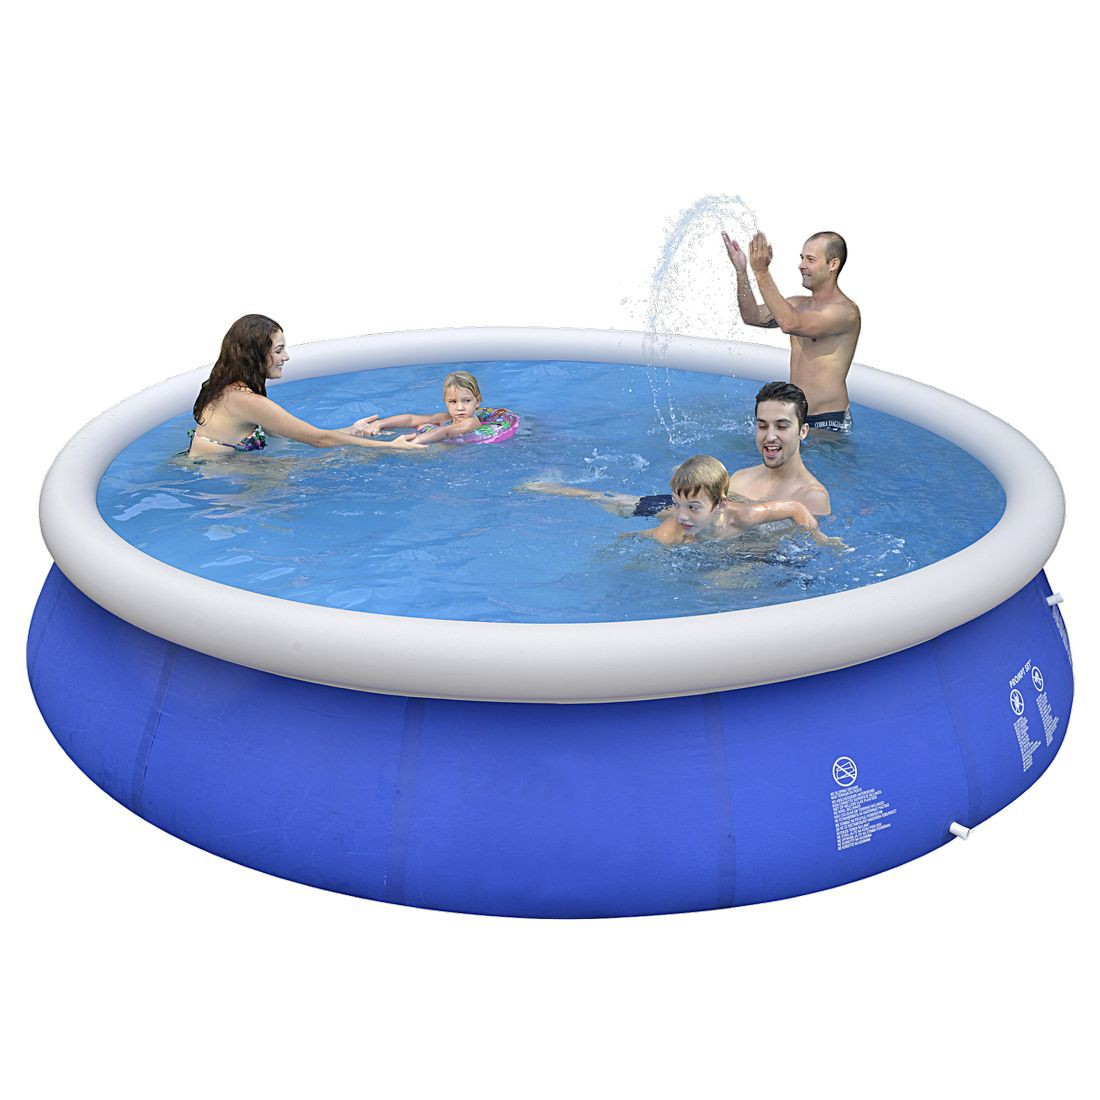 Jilong prompt set pool marin blue 450 set kit piscine for Accessoire piscine jilong